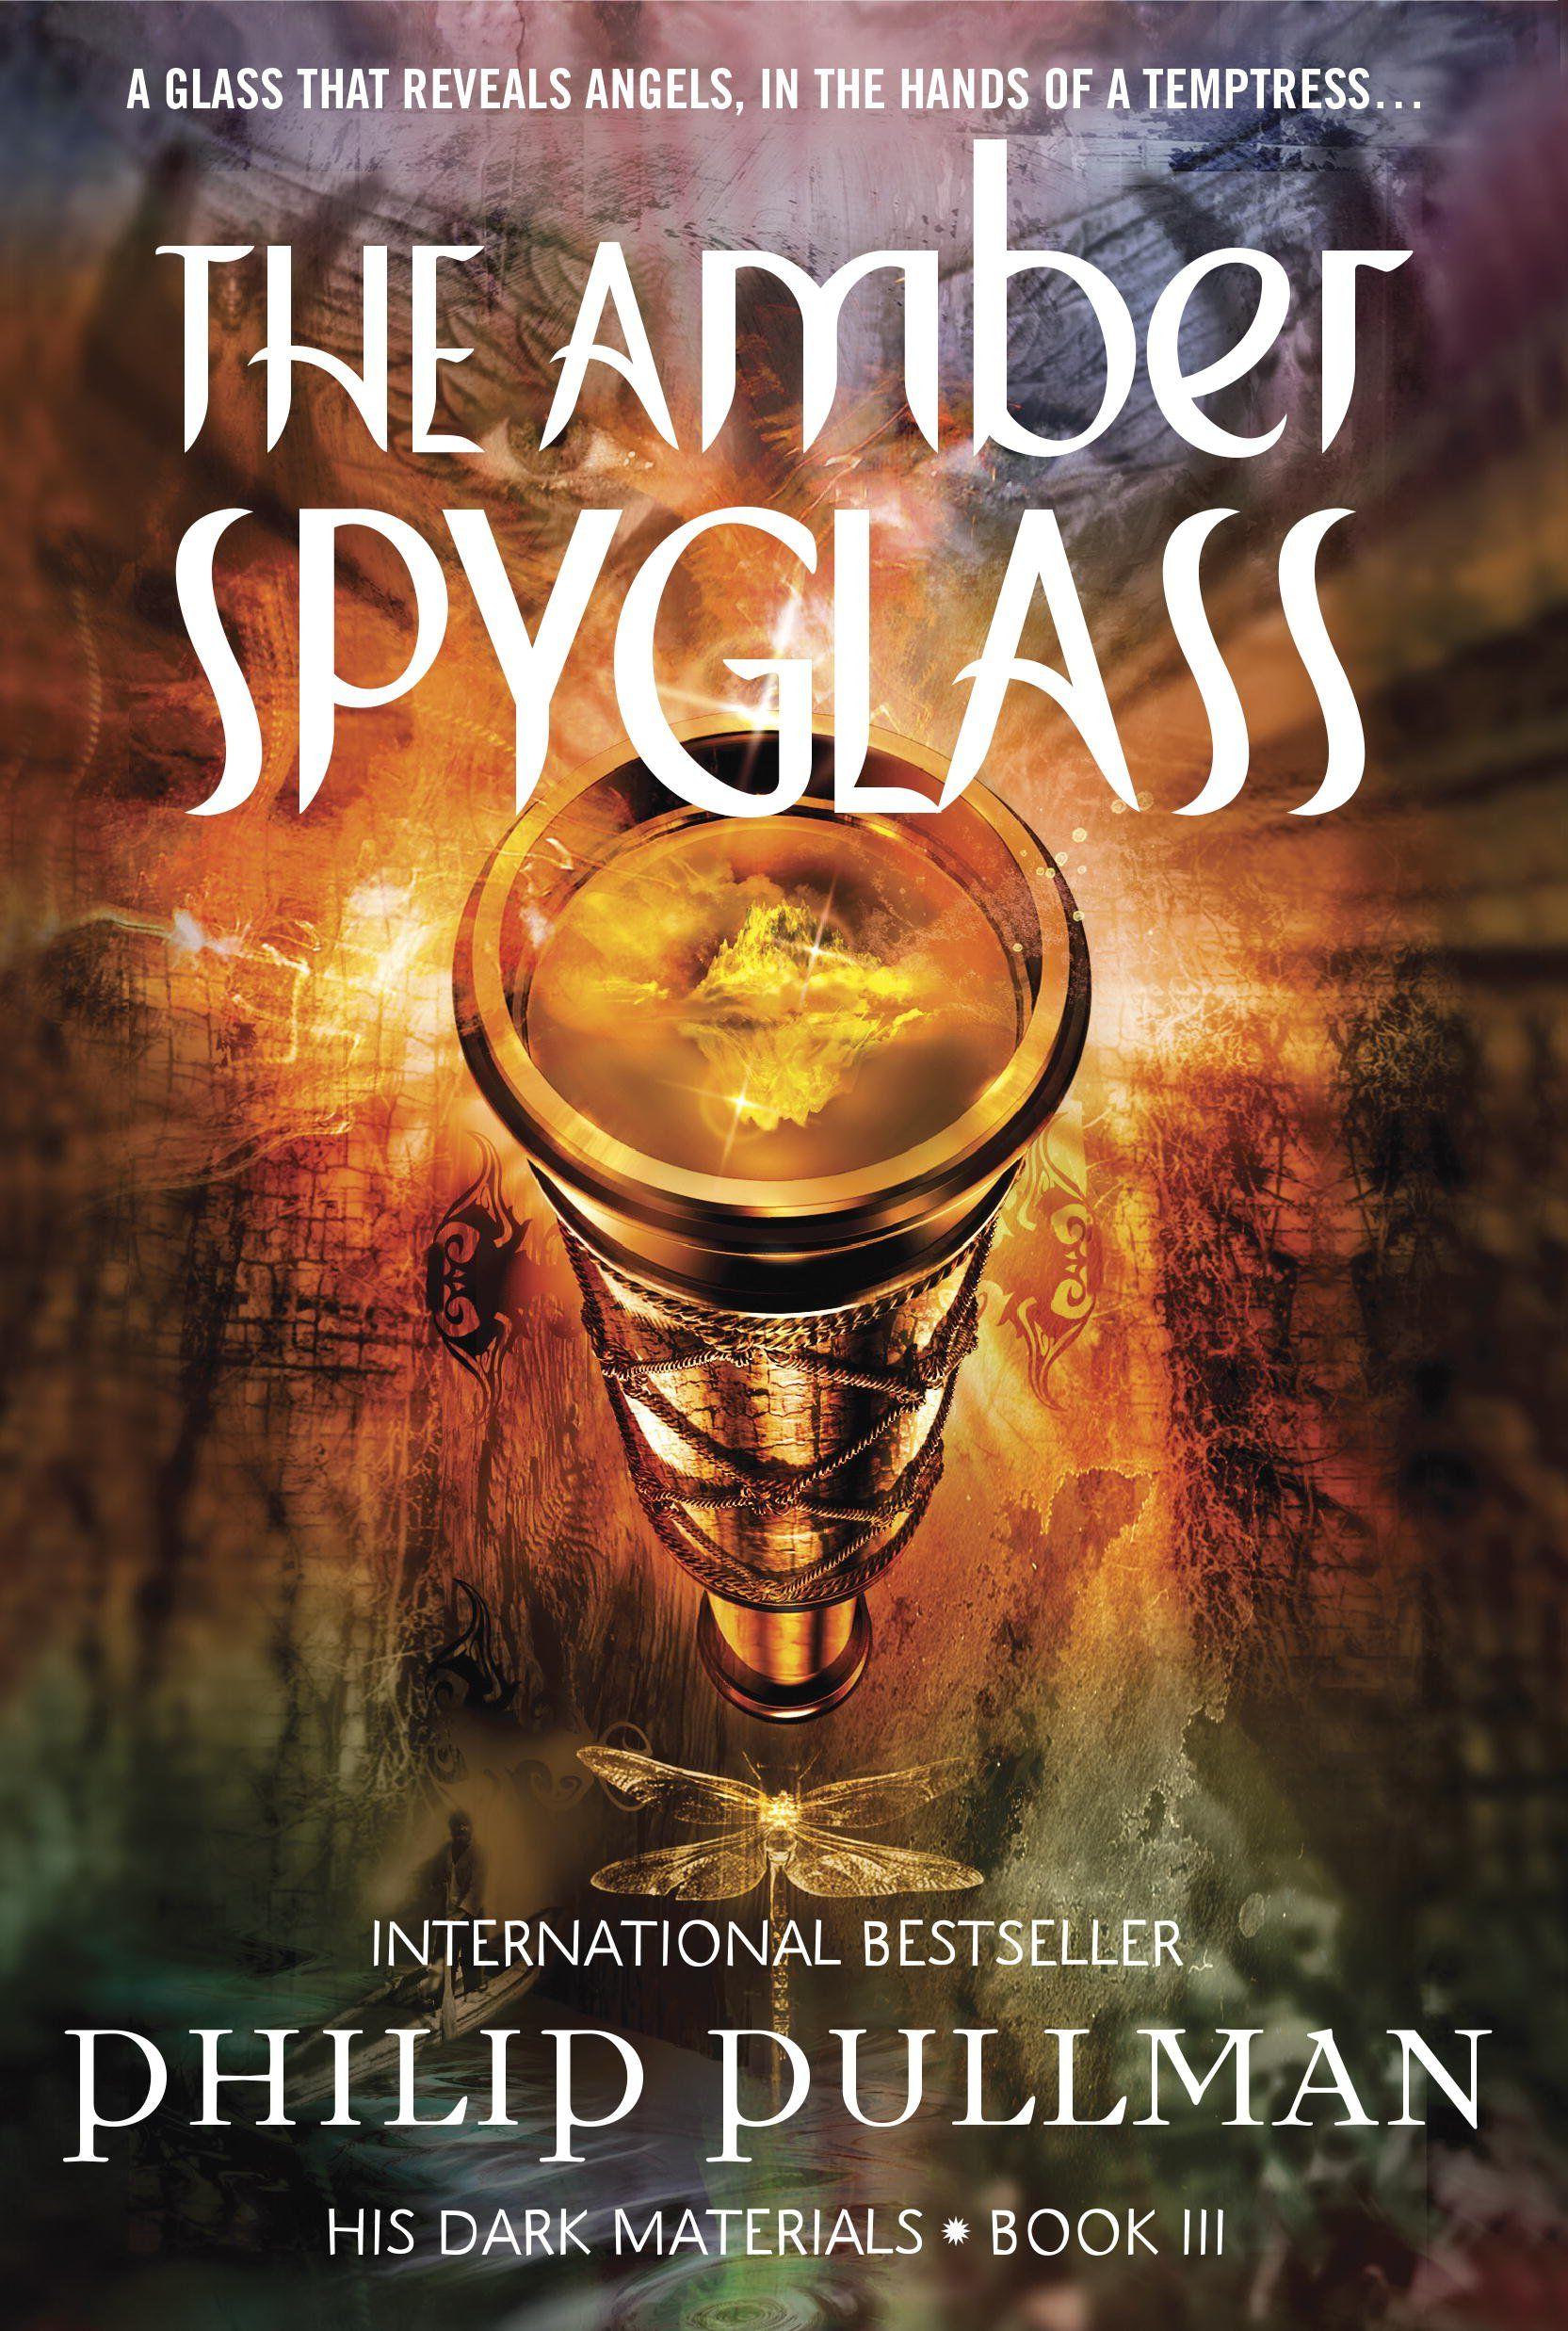 Ebook The Amber Spyglass